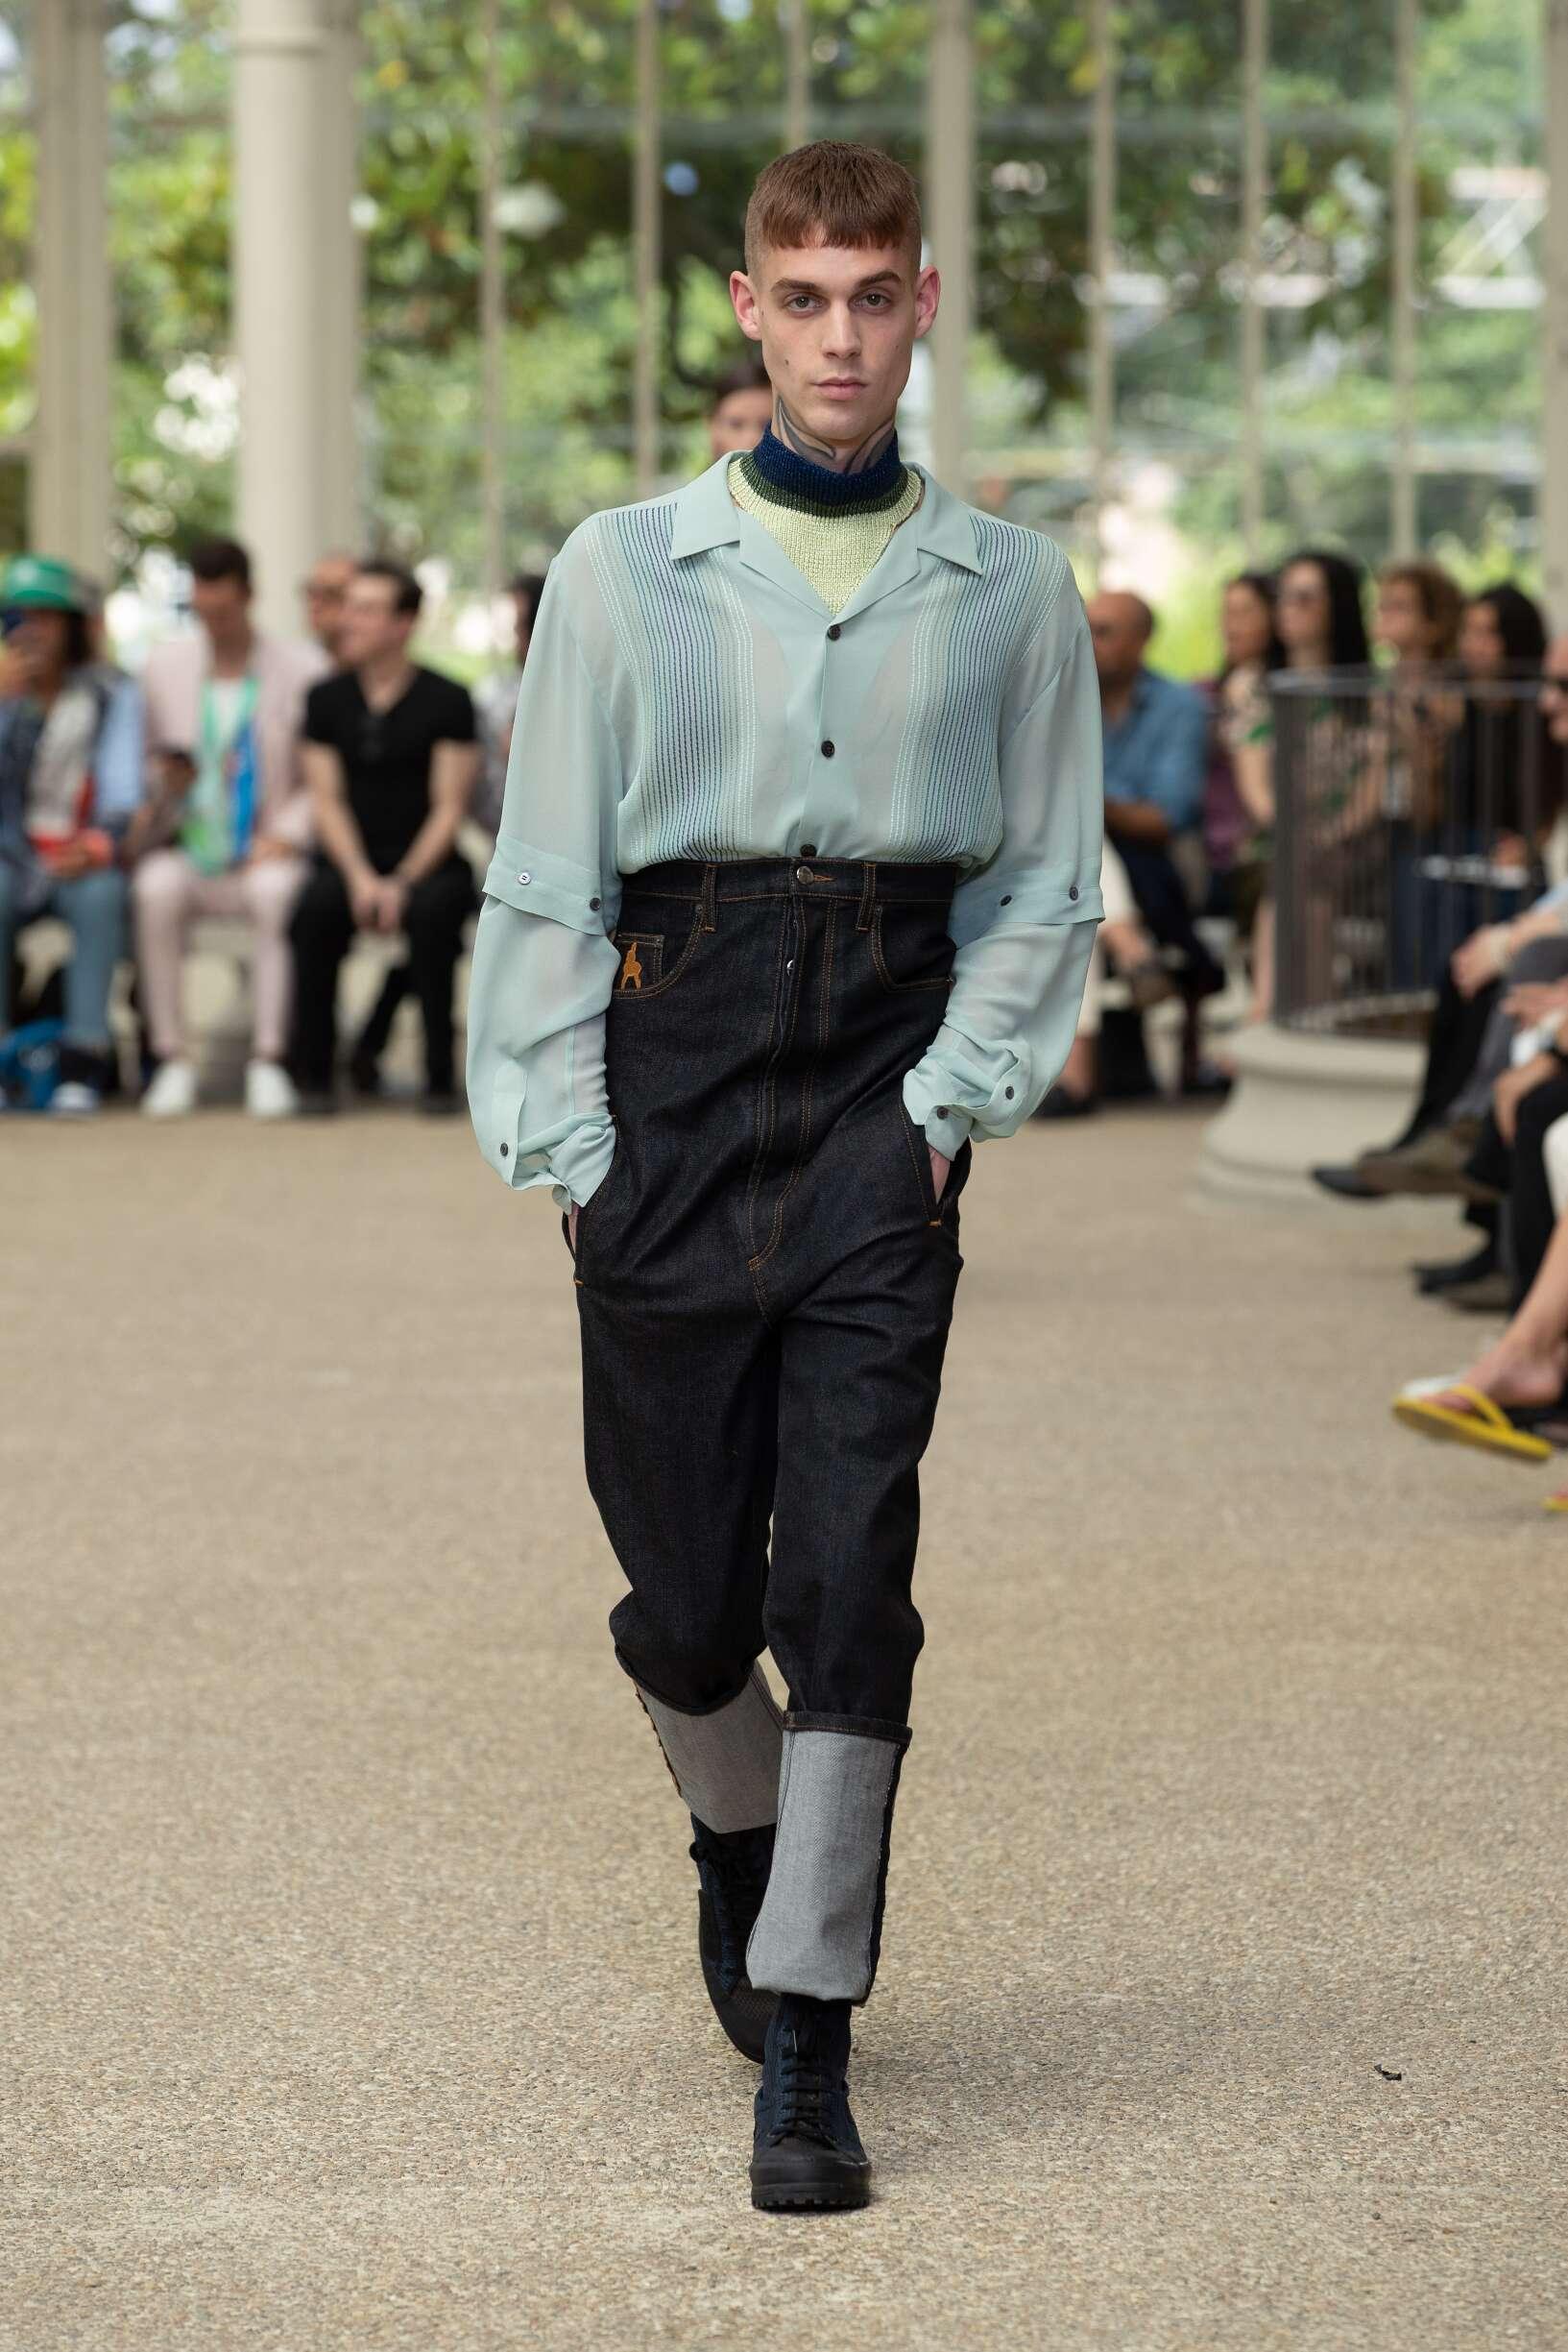 Catwalk Marco De vincenzo Man Fashion Show Summer 2020